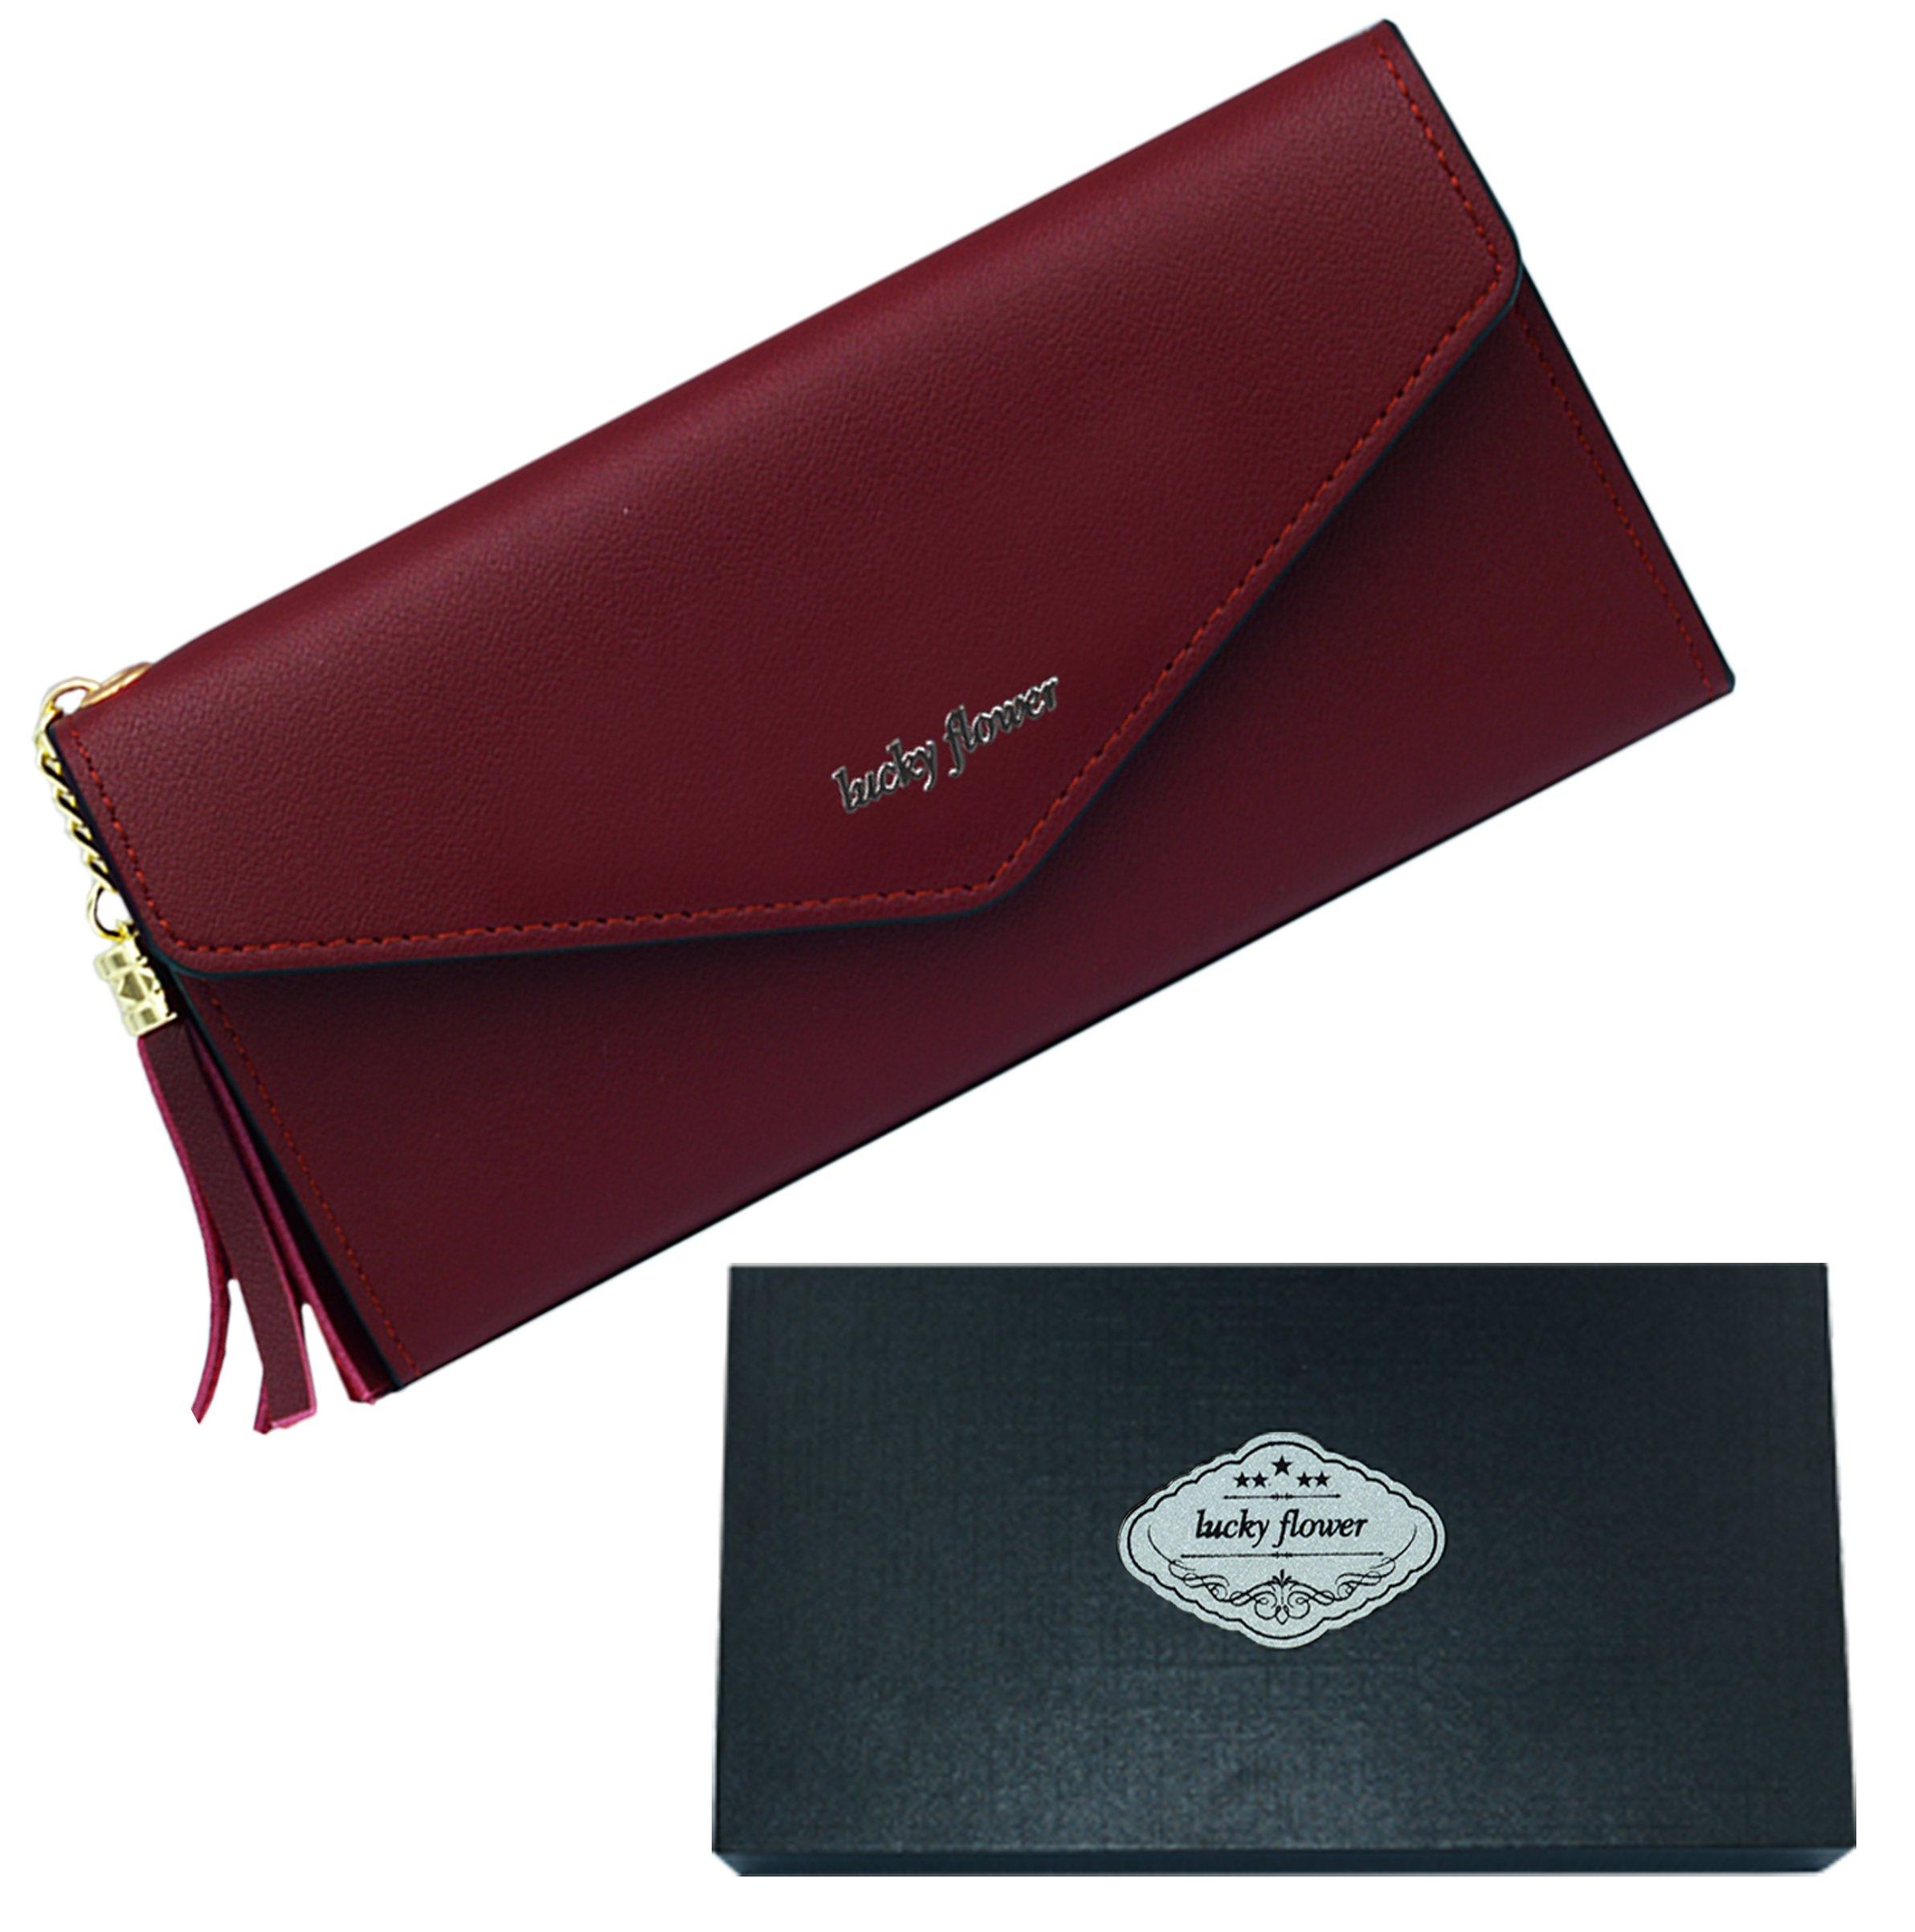 LUCKY FLOWER Leather Wallets for Women,Long Passport Holder Wallet,Multi Card Case Purse (Wine Red) …